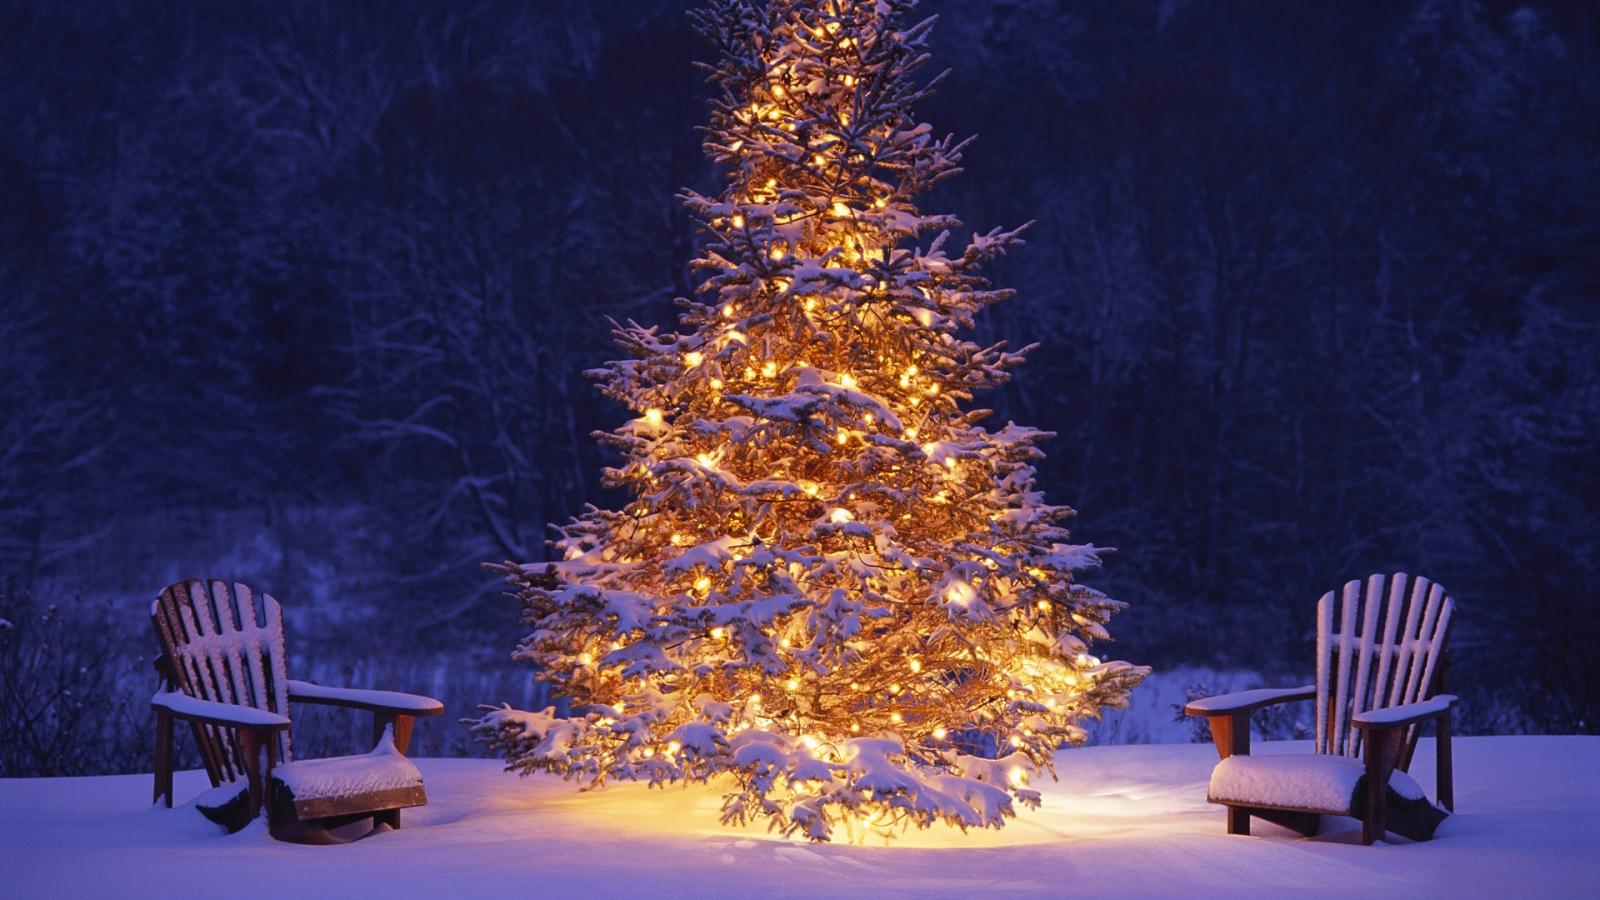 free christmas tree desktop wallpaper 2015   Grasscloth Wallpaper 1600x900